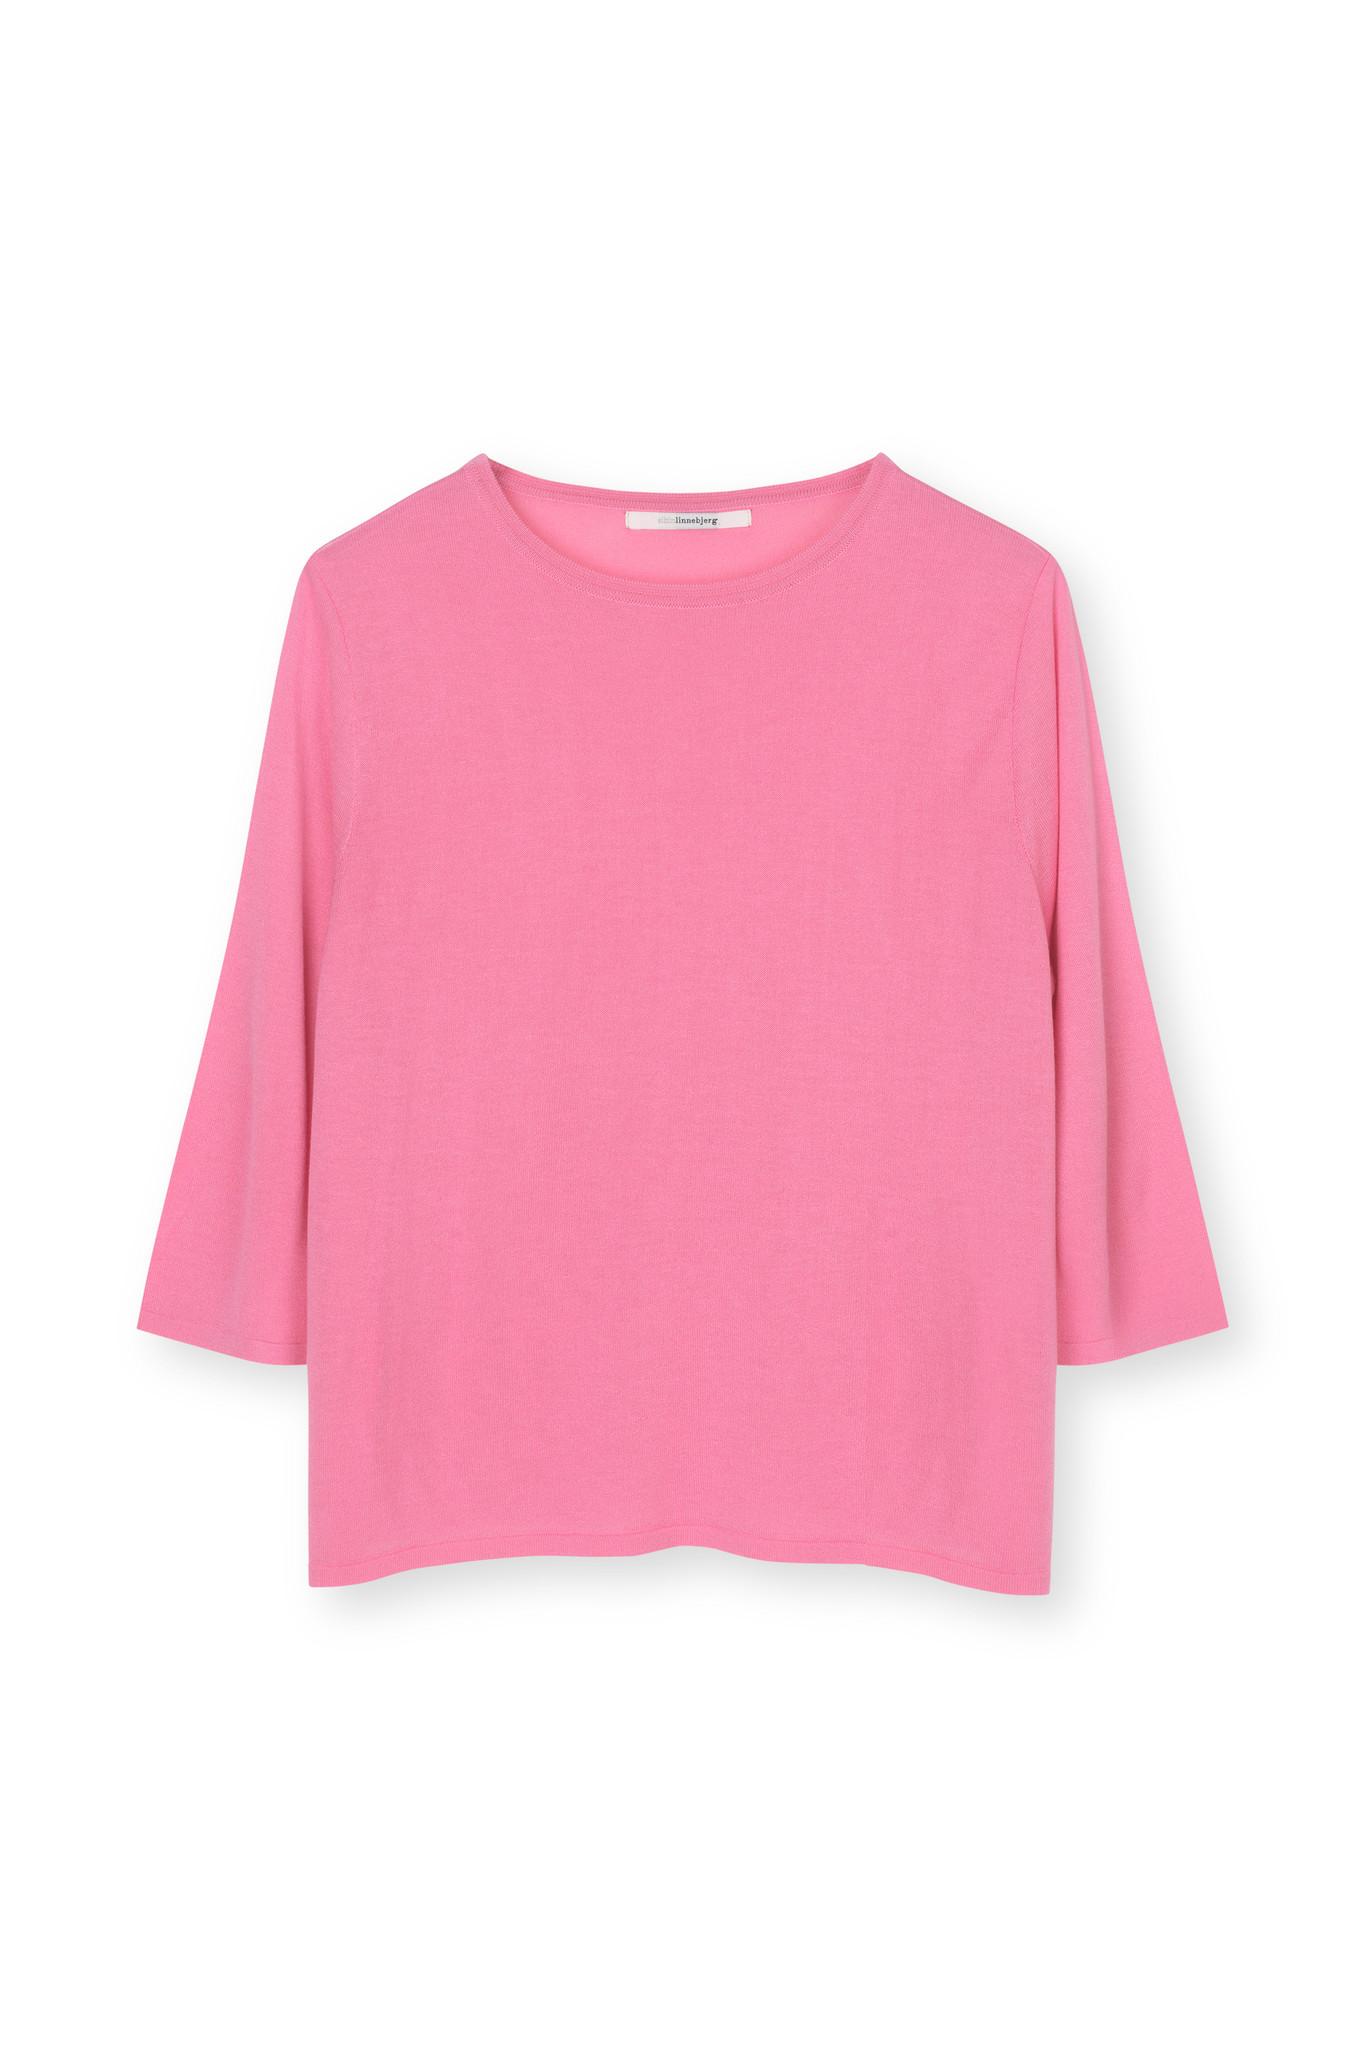 Lovisa Tee - Flamingo Roze-1